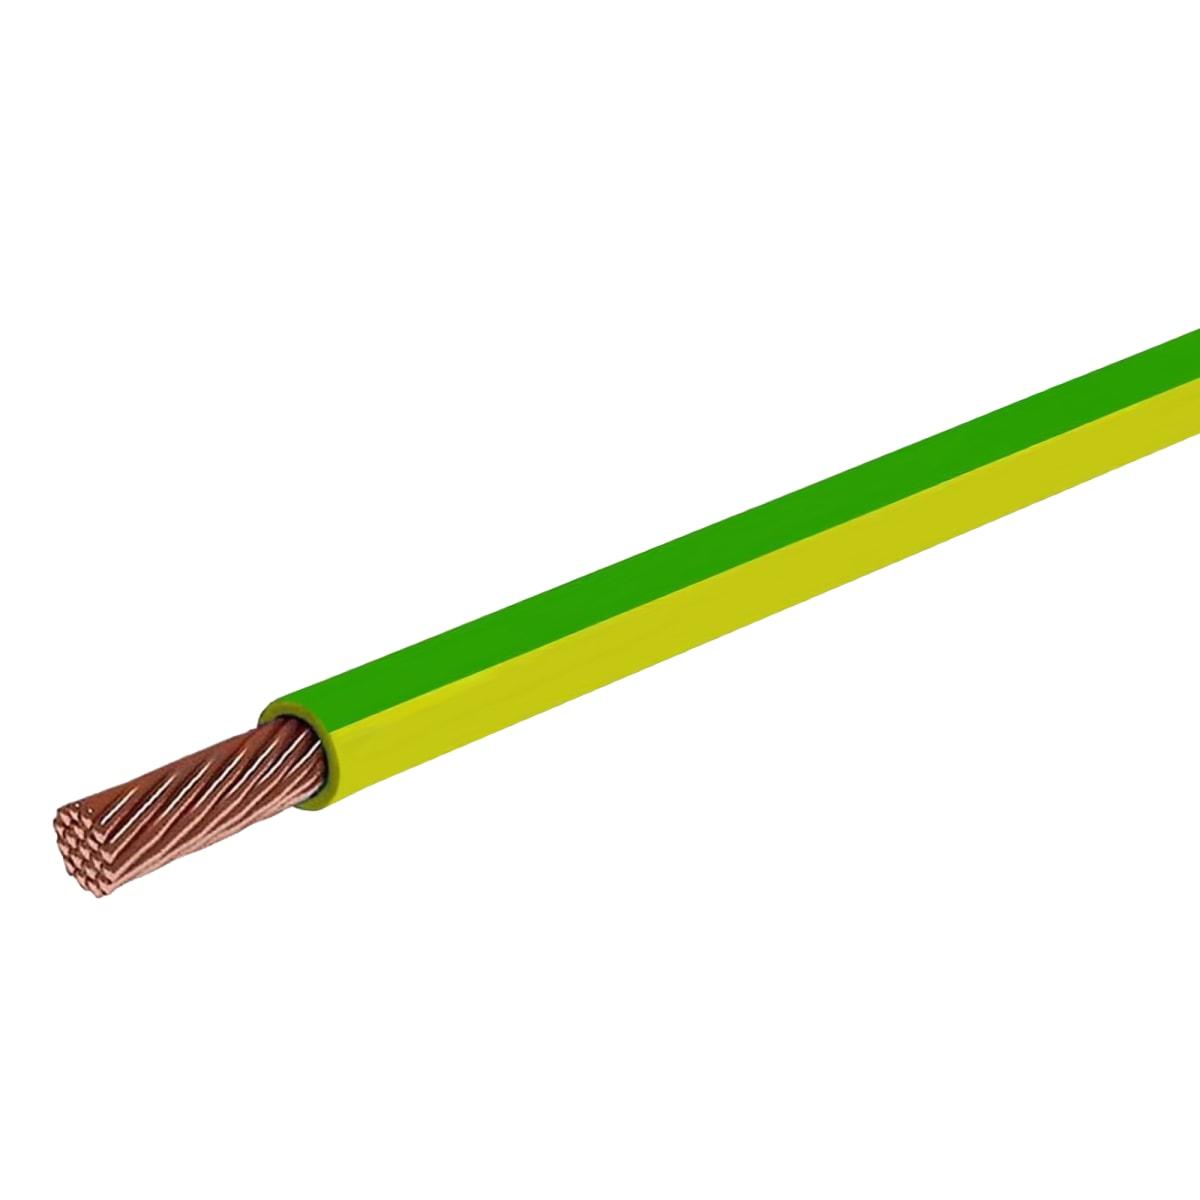 Провод Ореол ПуГВ 1x2.5, на отрез, цвет желто-зеленый